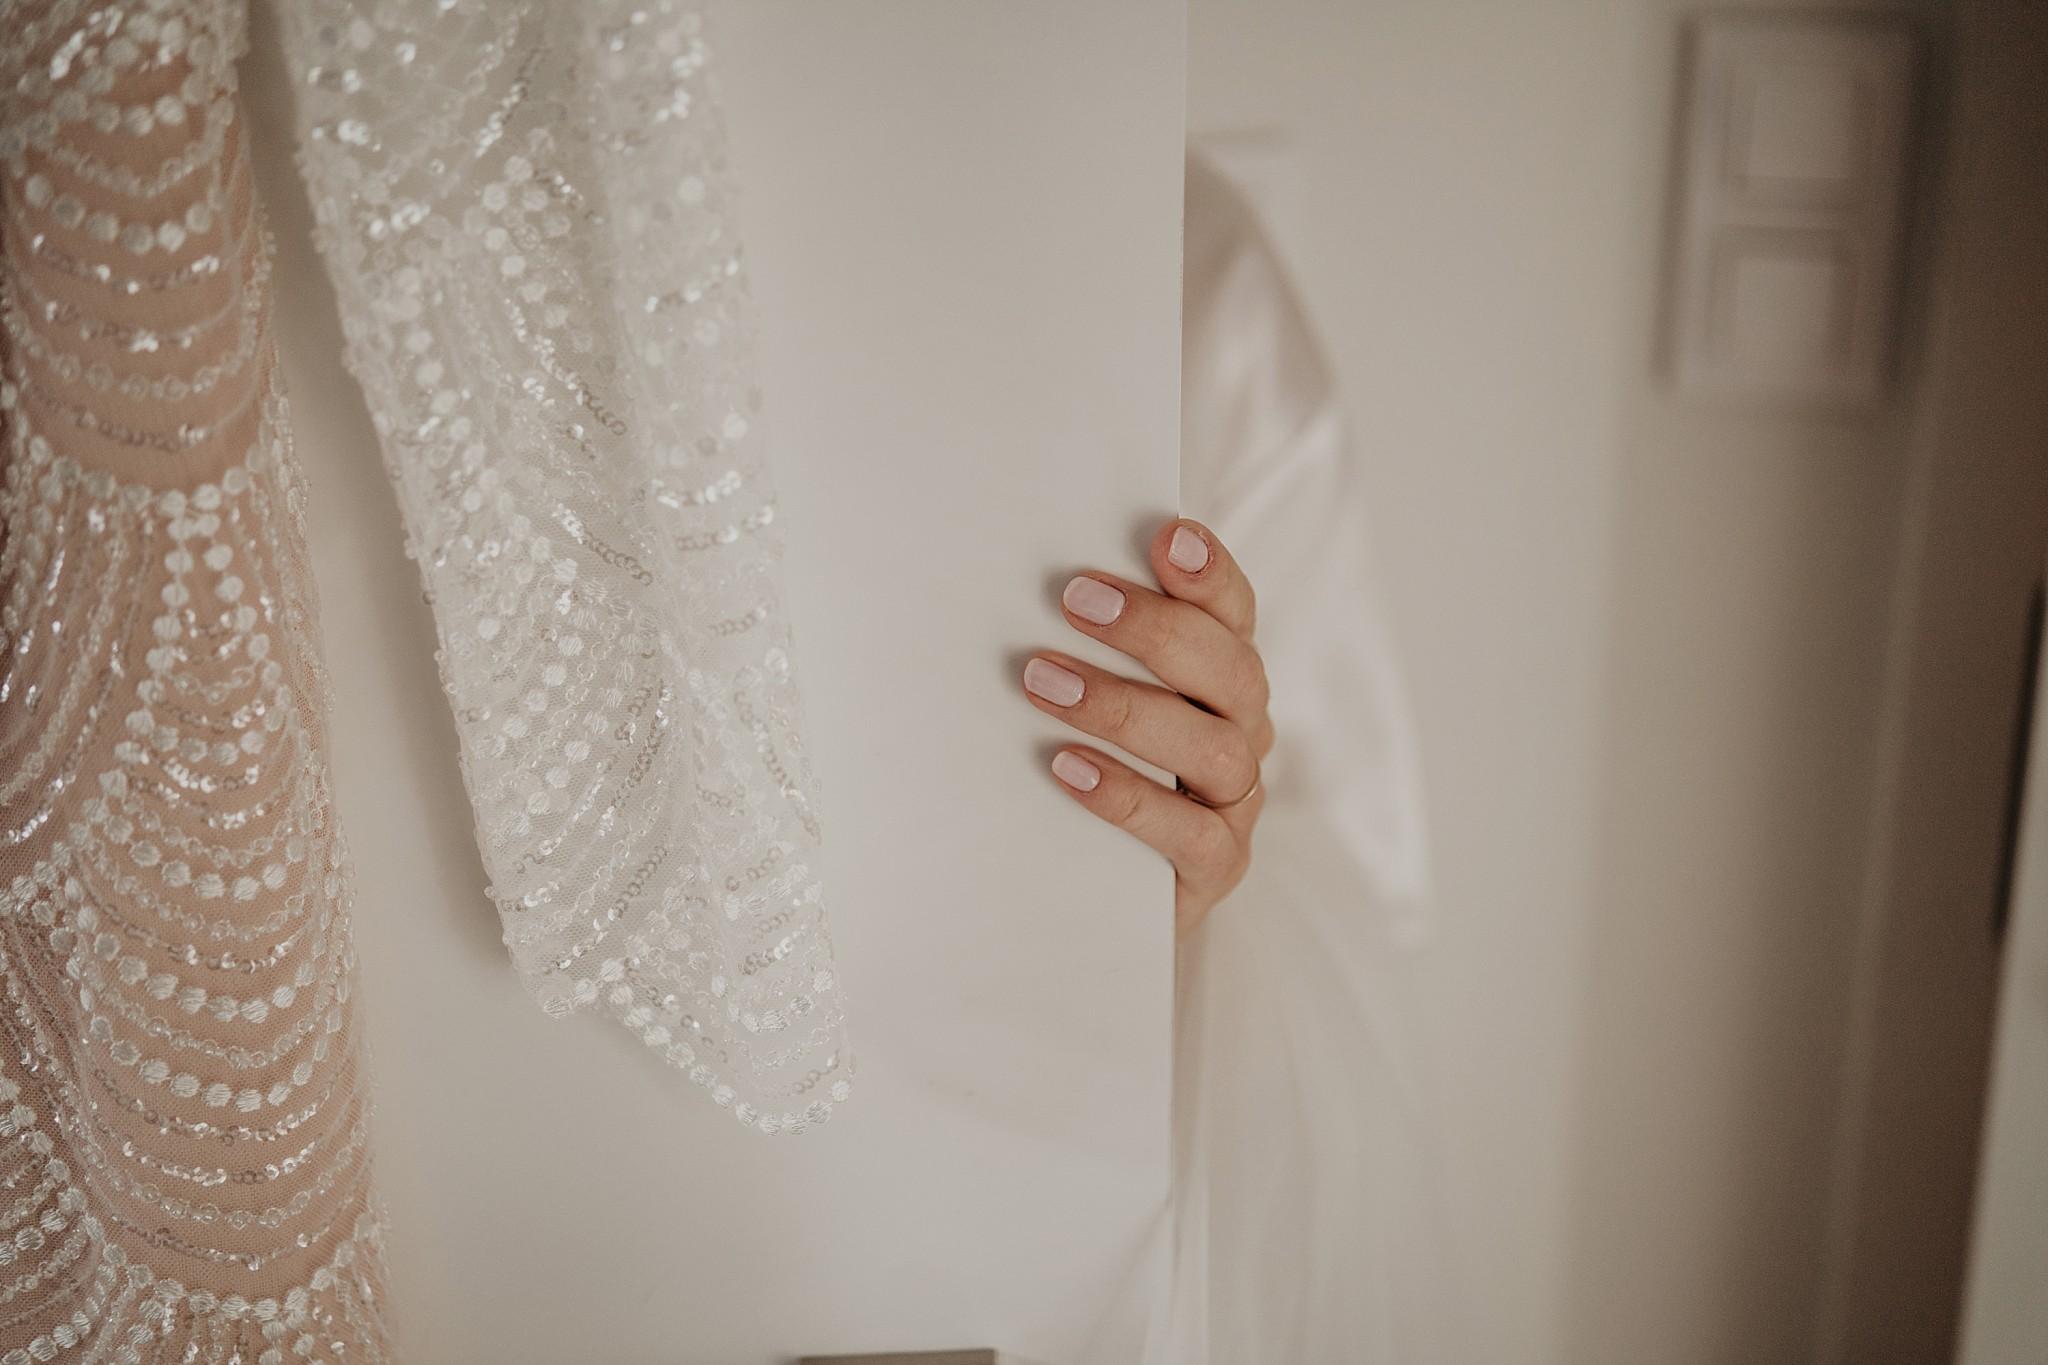 fotograf poznan wesele dobra truskawka piekne wesele pod poznaniem wesele w dobrej truskawce piekna para mloda slub marzen slub koronawirus slub listopad wesele koronawirus 065